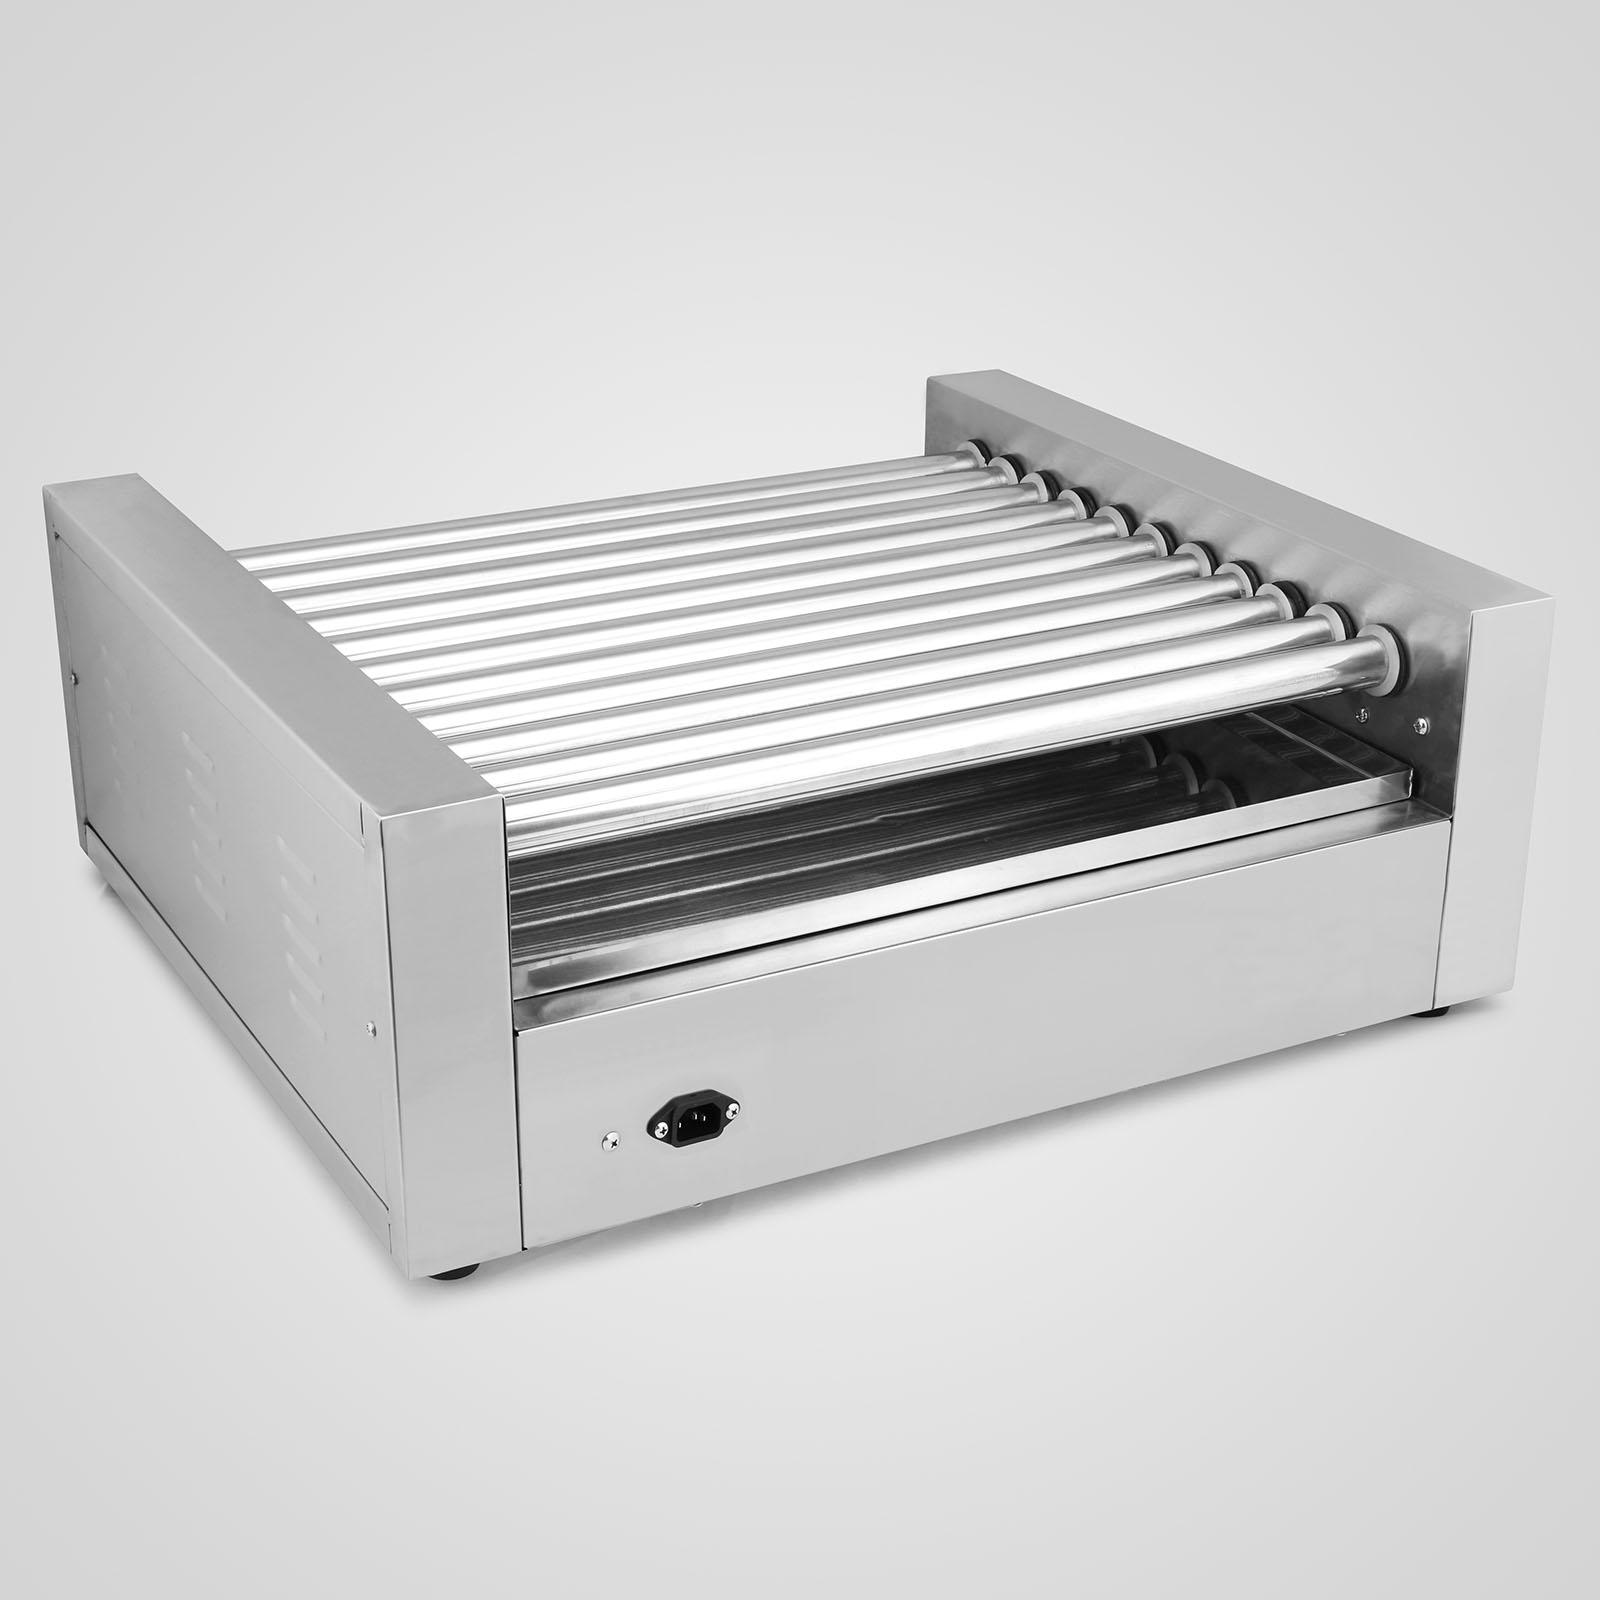 Ebay - Hot dog roller grill with bun warmer ...